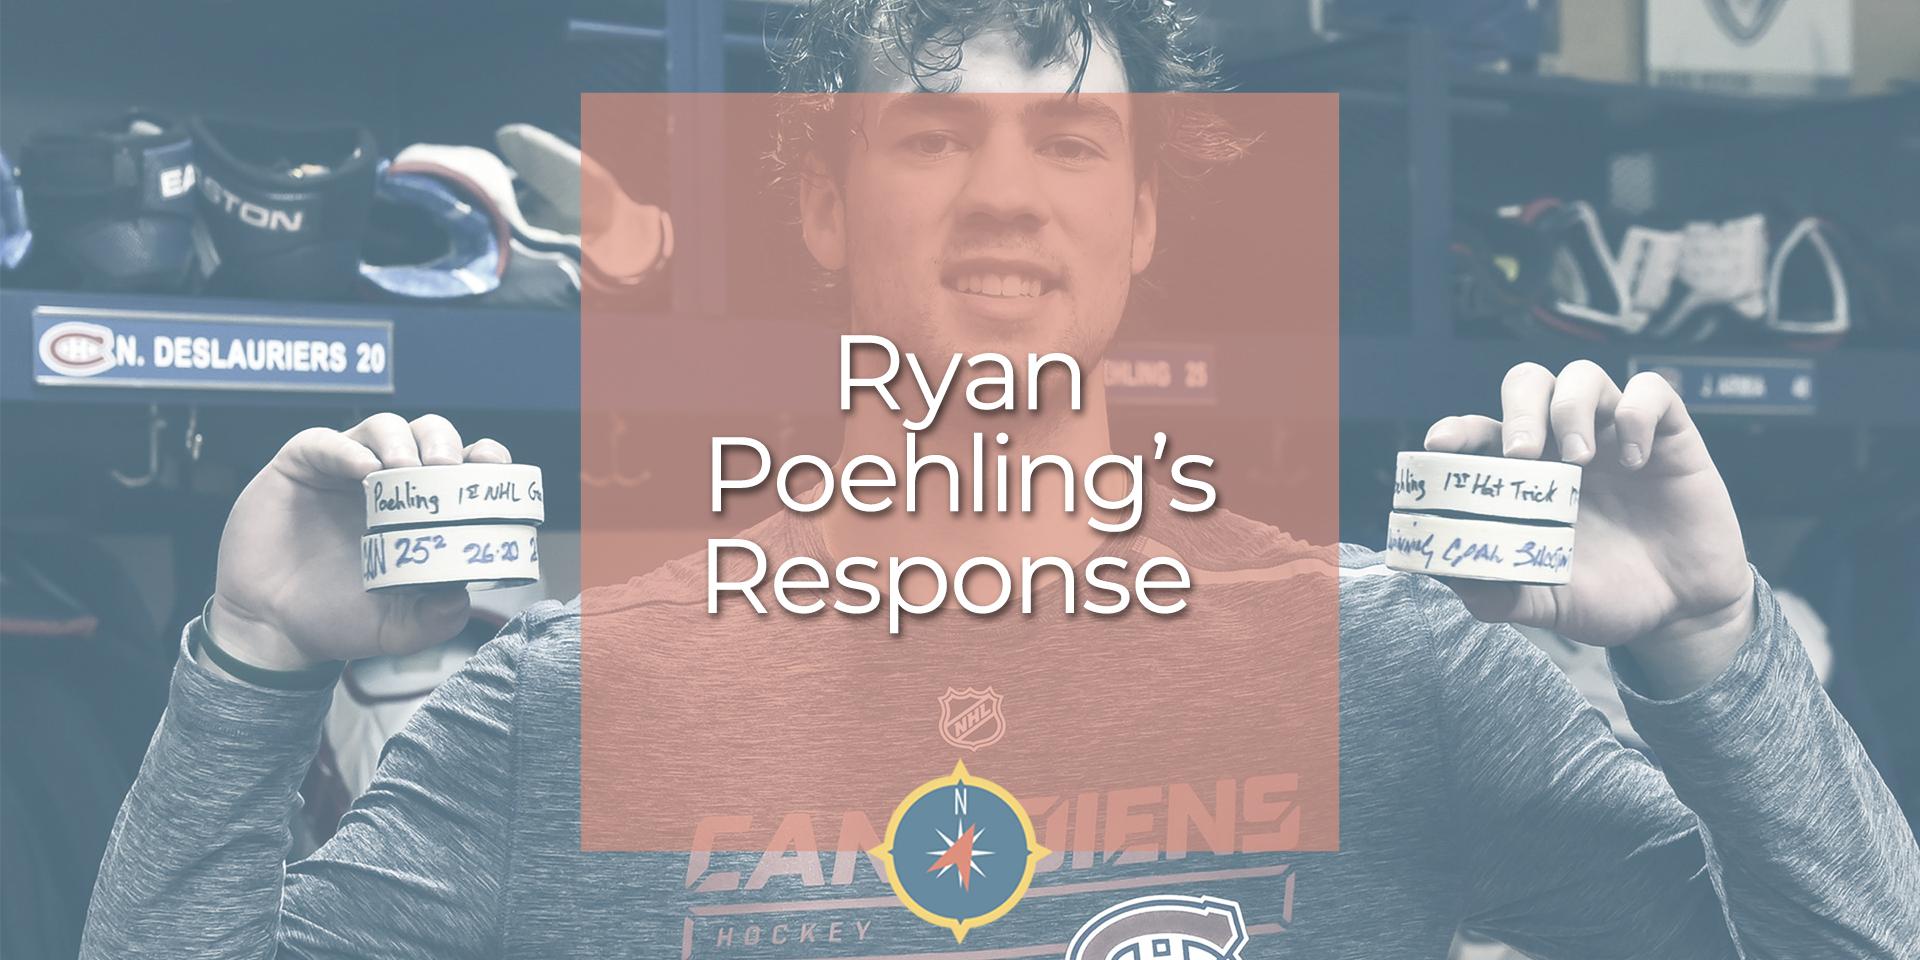 Ryan Poehling's Response to His First NHL Game